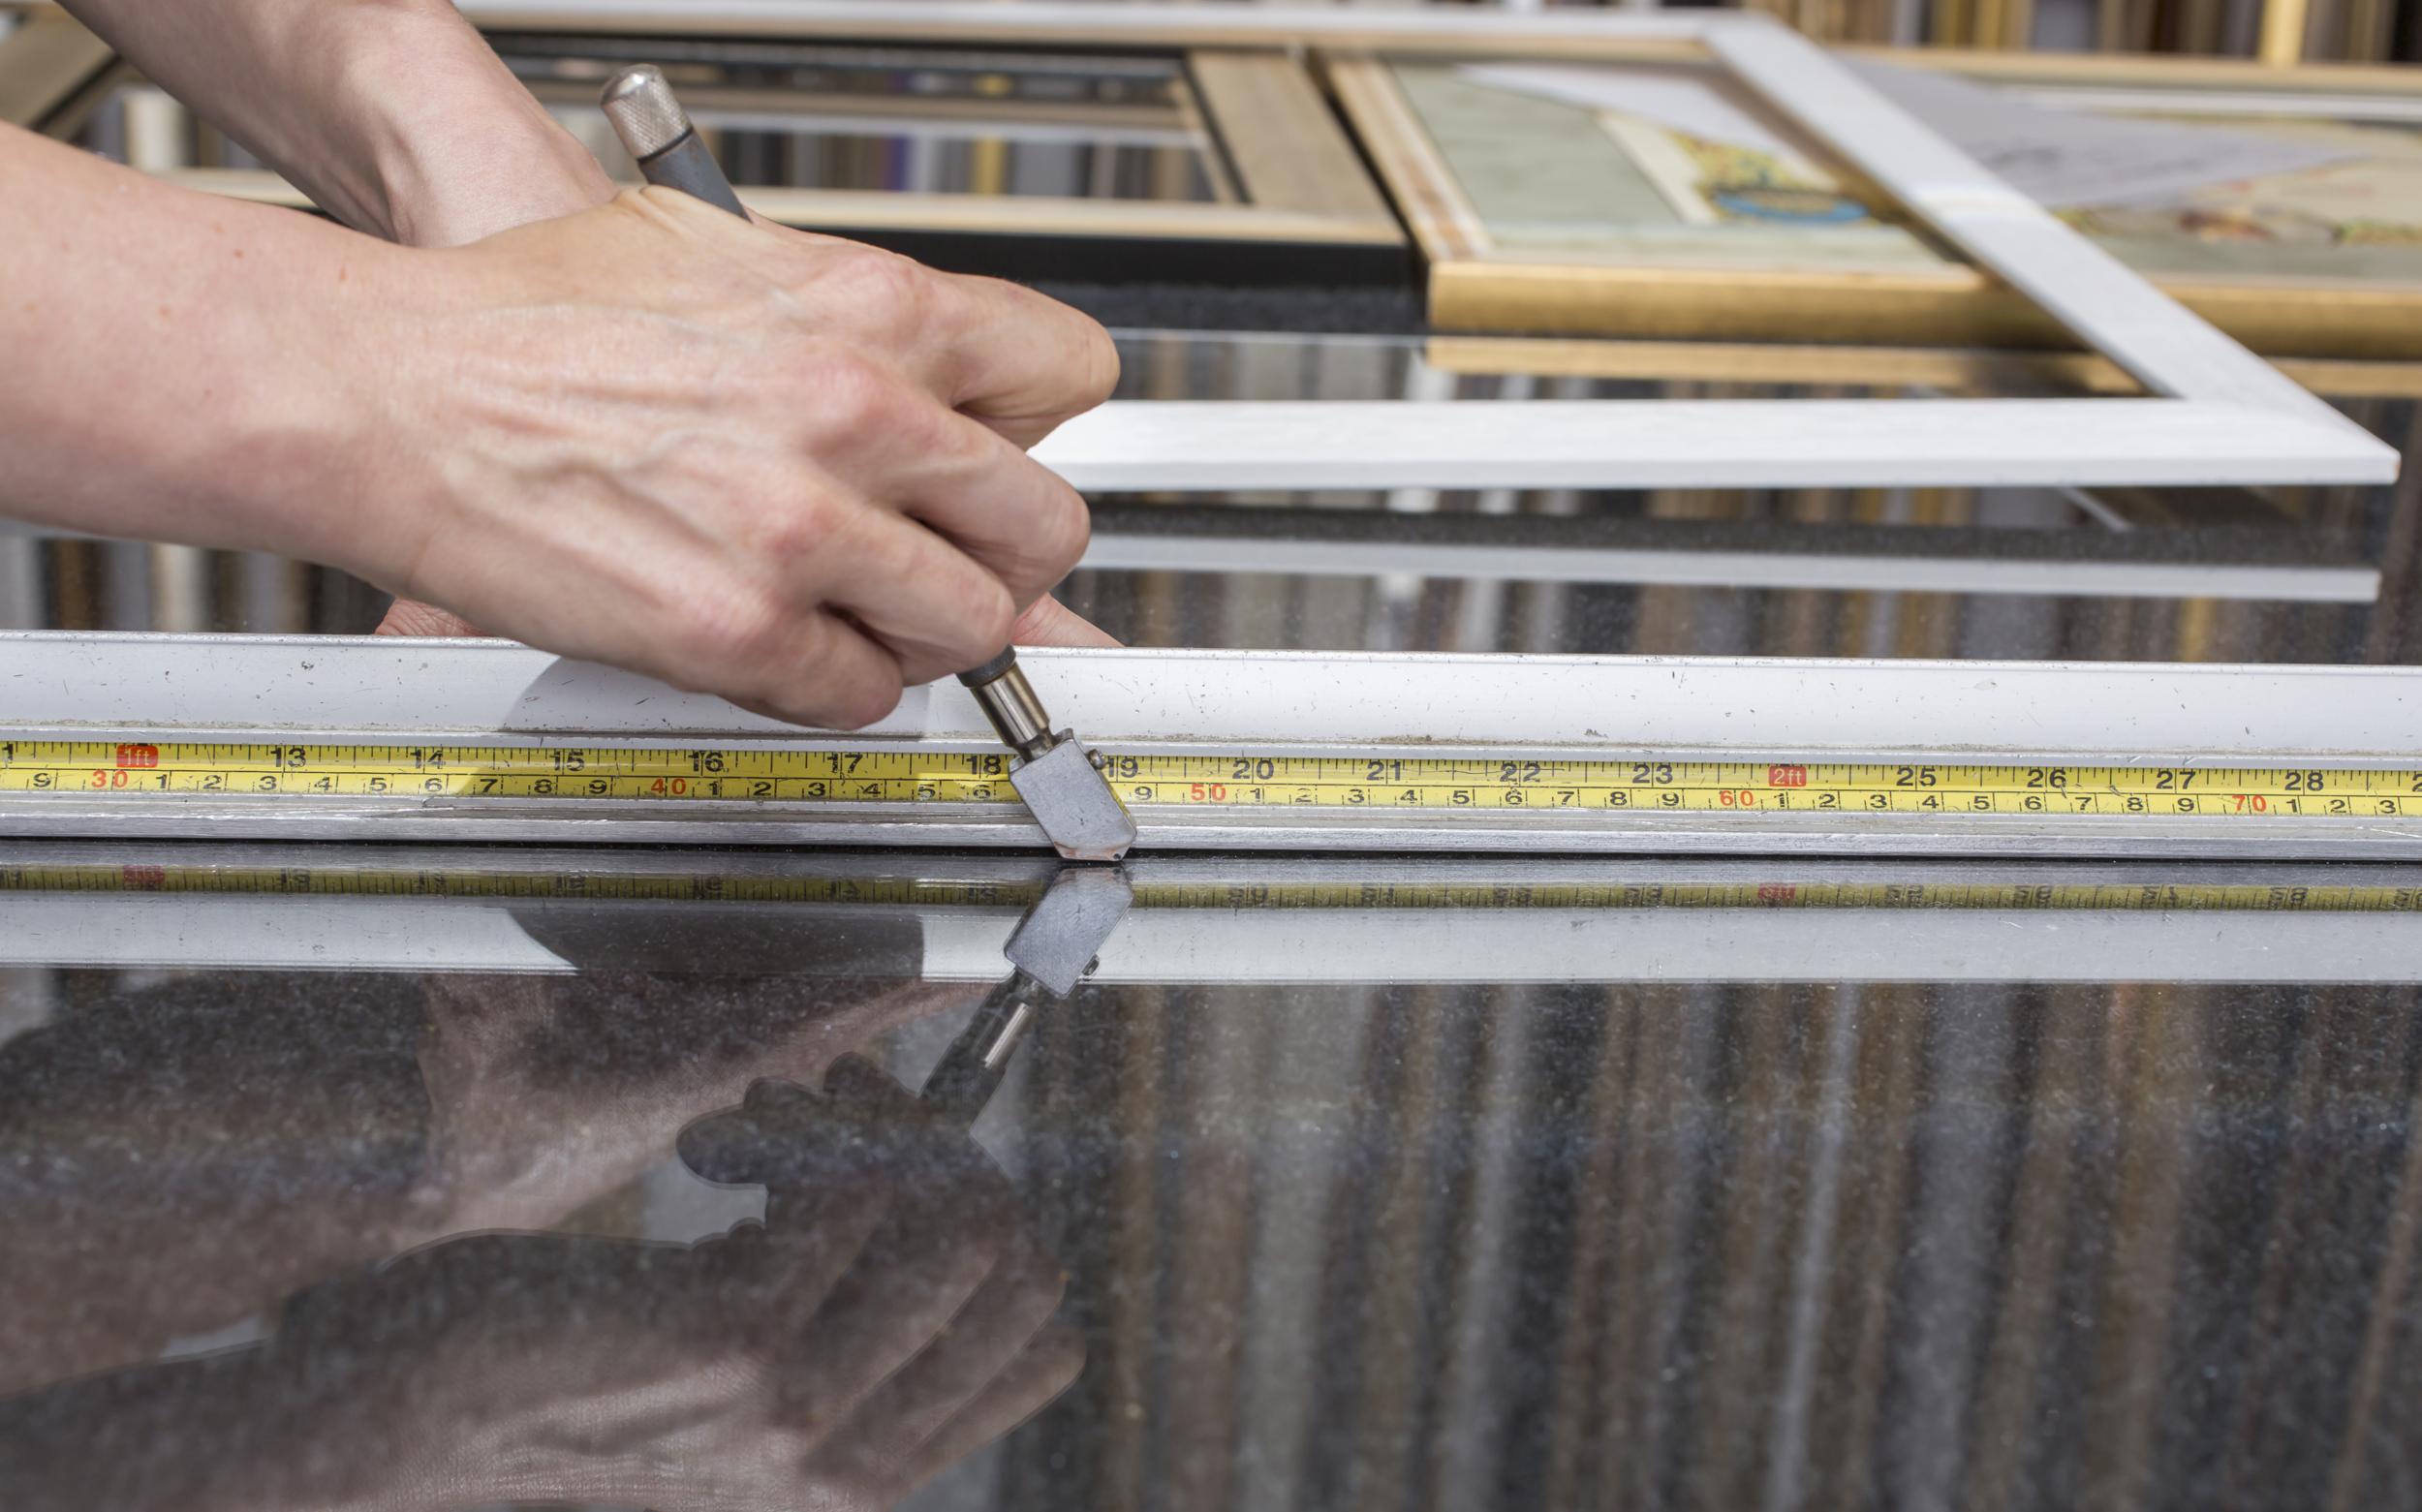 Installation - Build & Print Fitters | AV & Lighting | Pasma Certified